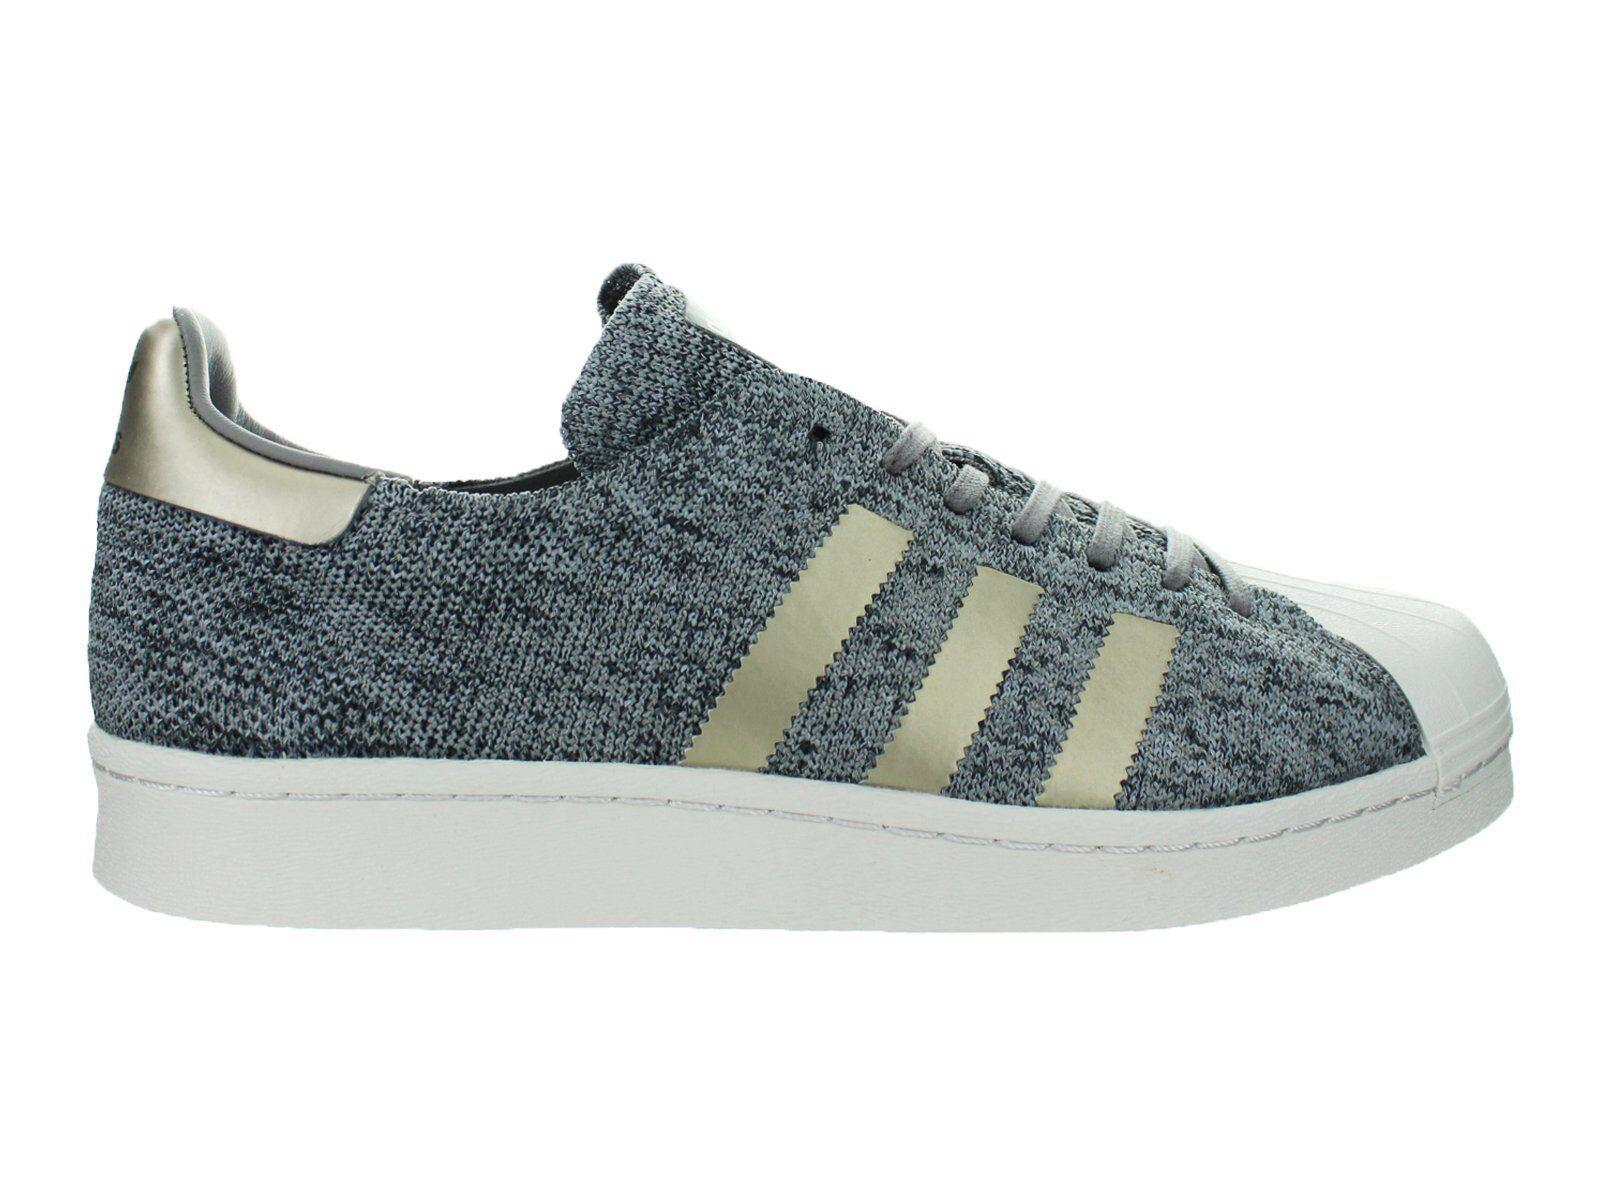 Adidas Originals Superstar Boost Primeknit Noble Metals Grey gold White BB8973